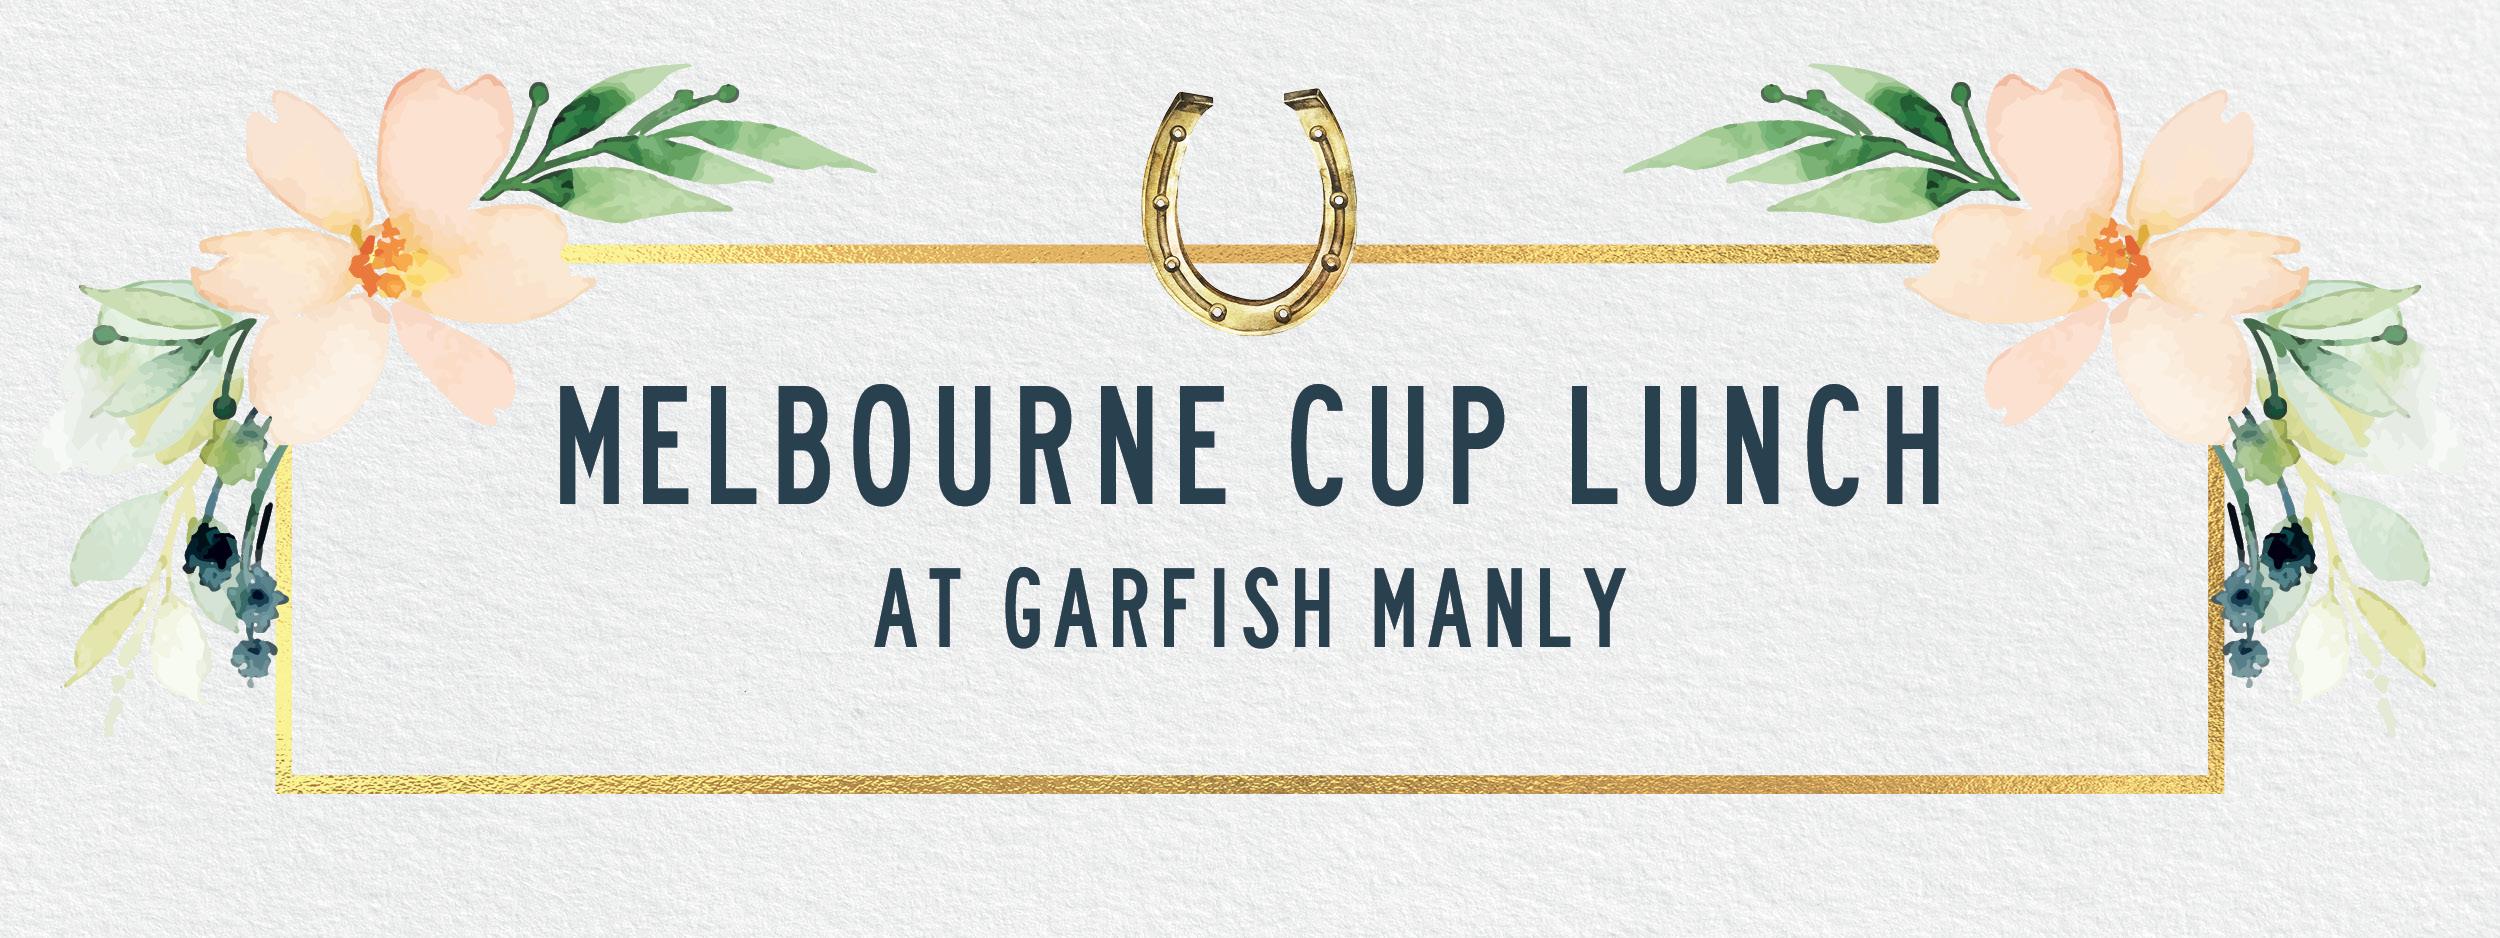 GAR008-Melbourne-Cup-Webpage-header (1).jpg